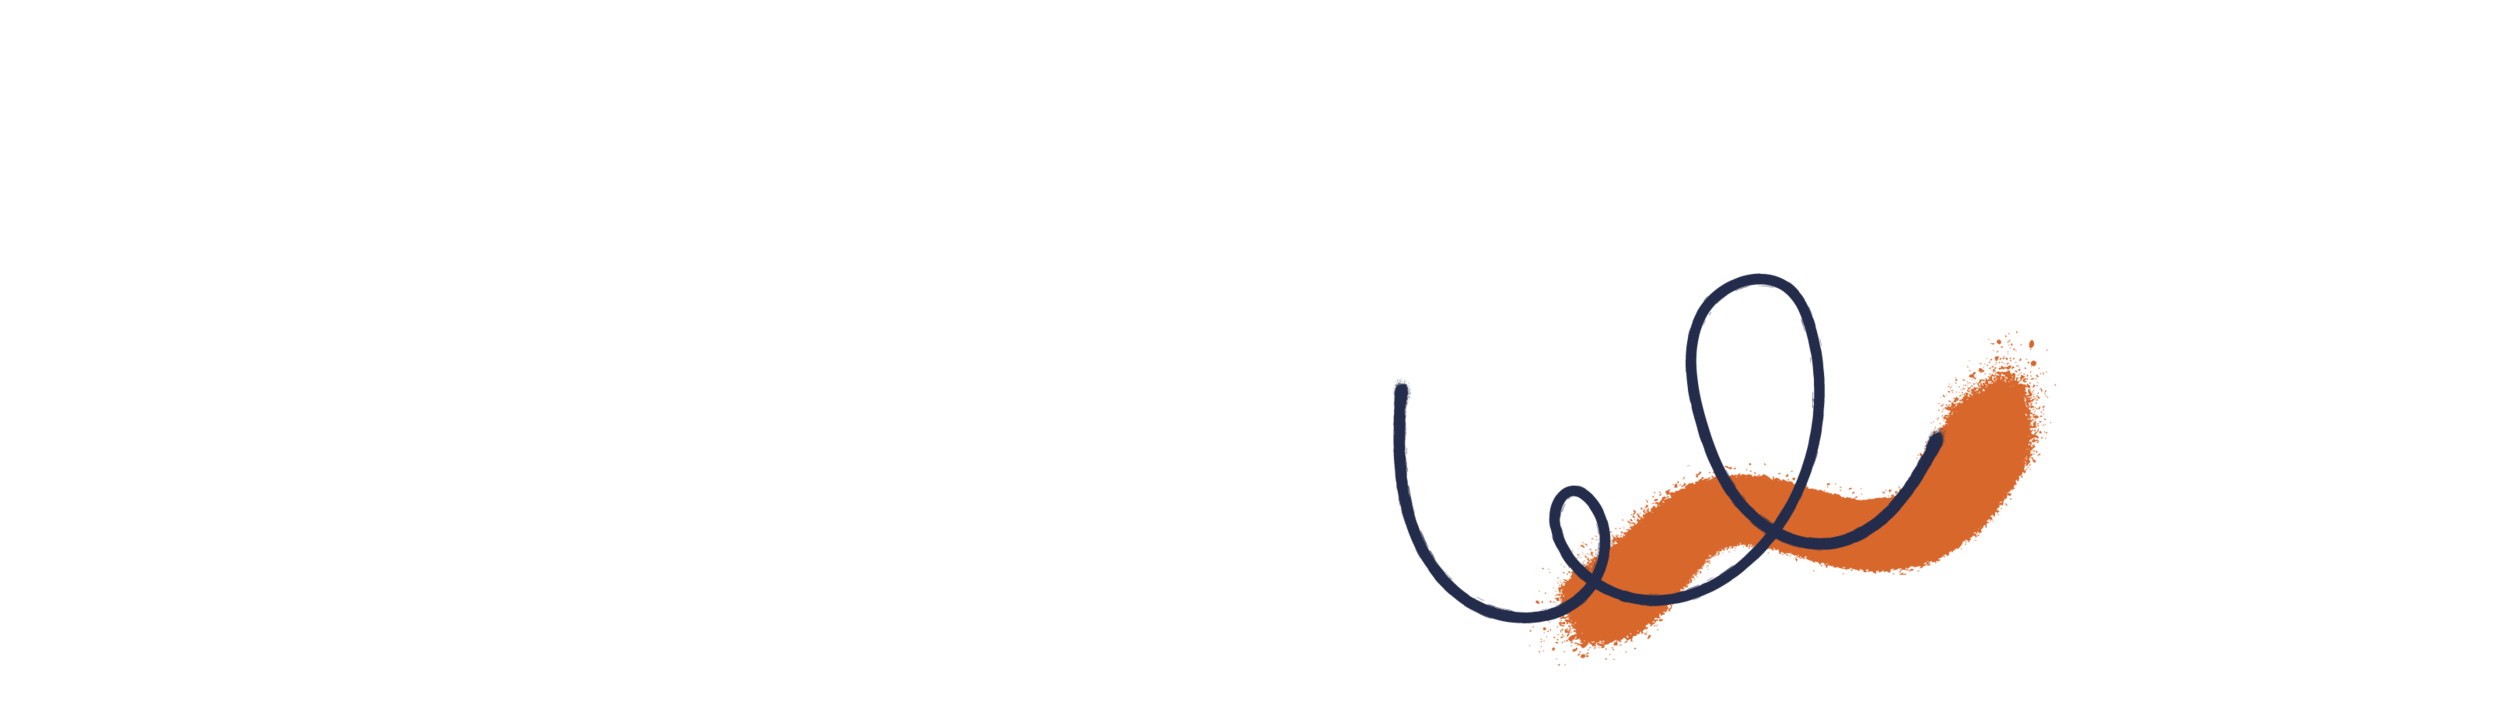 vb doodles-05.png